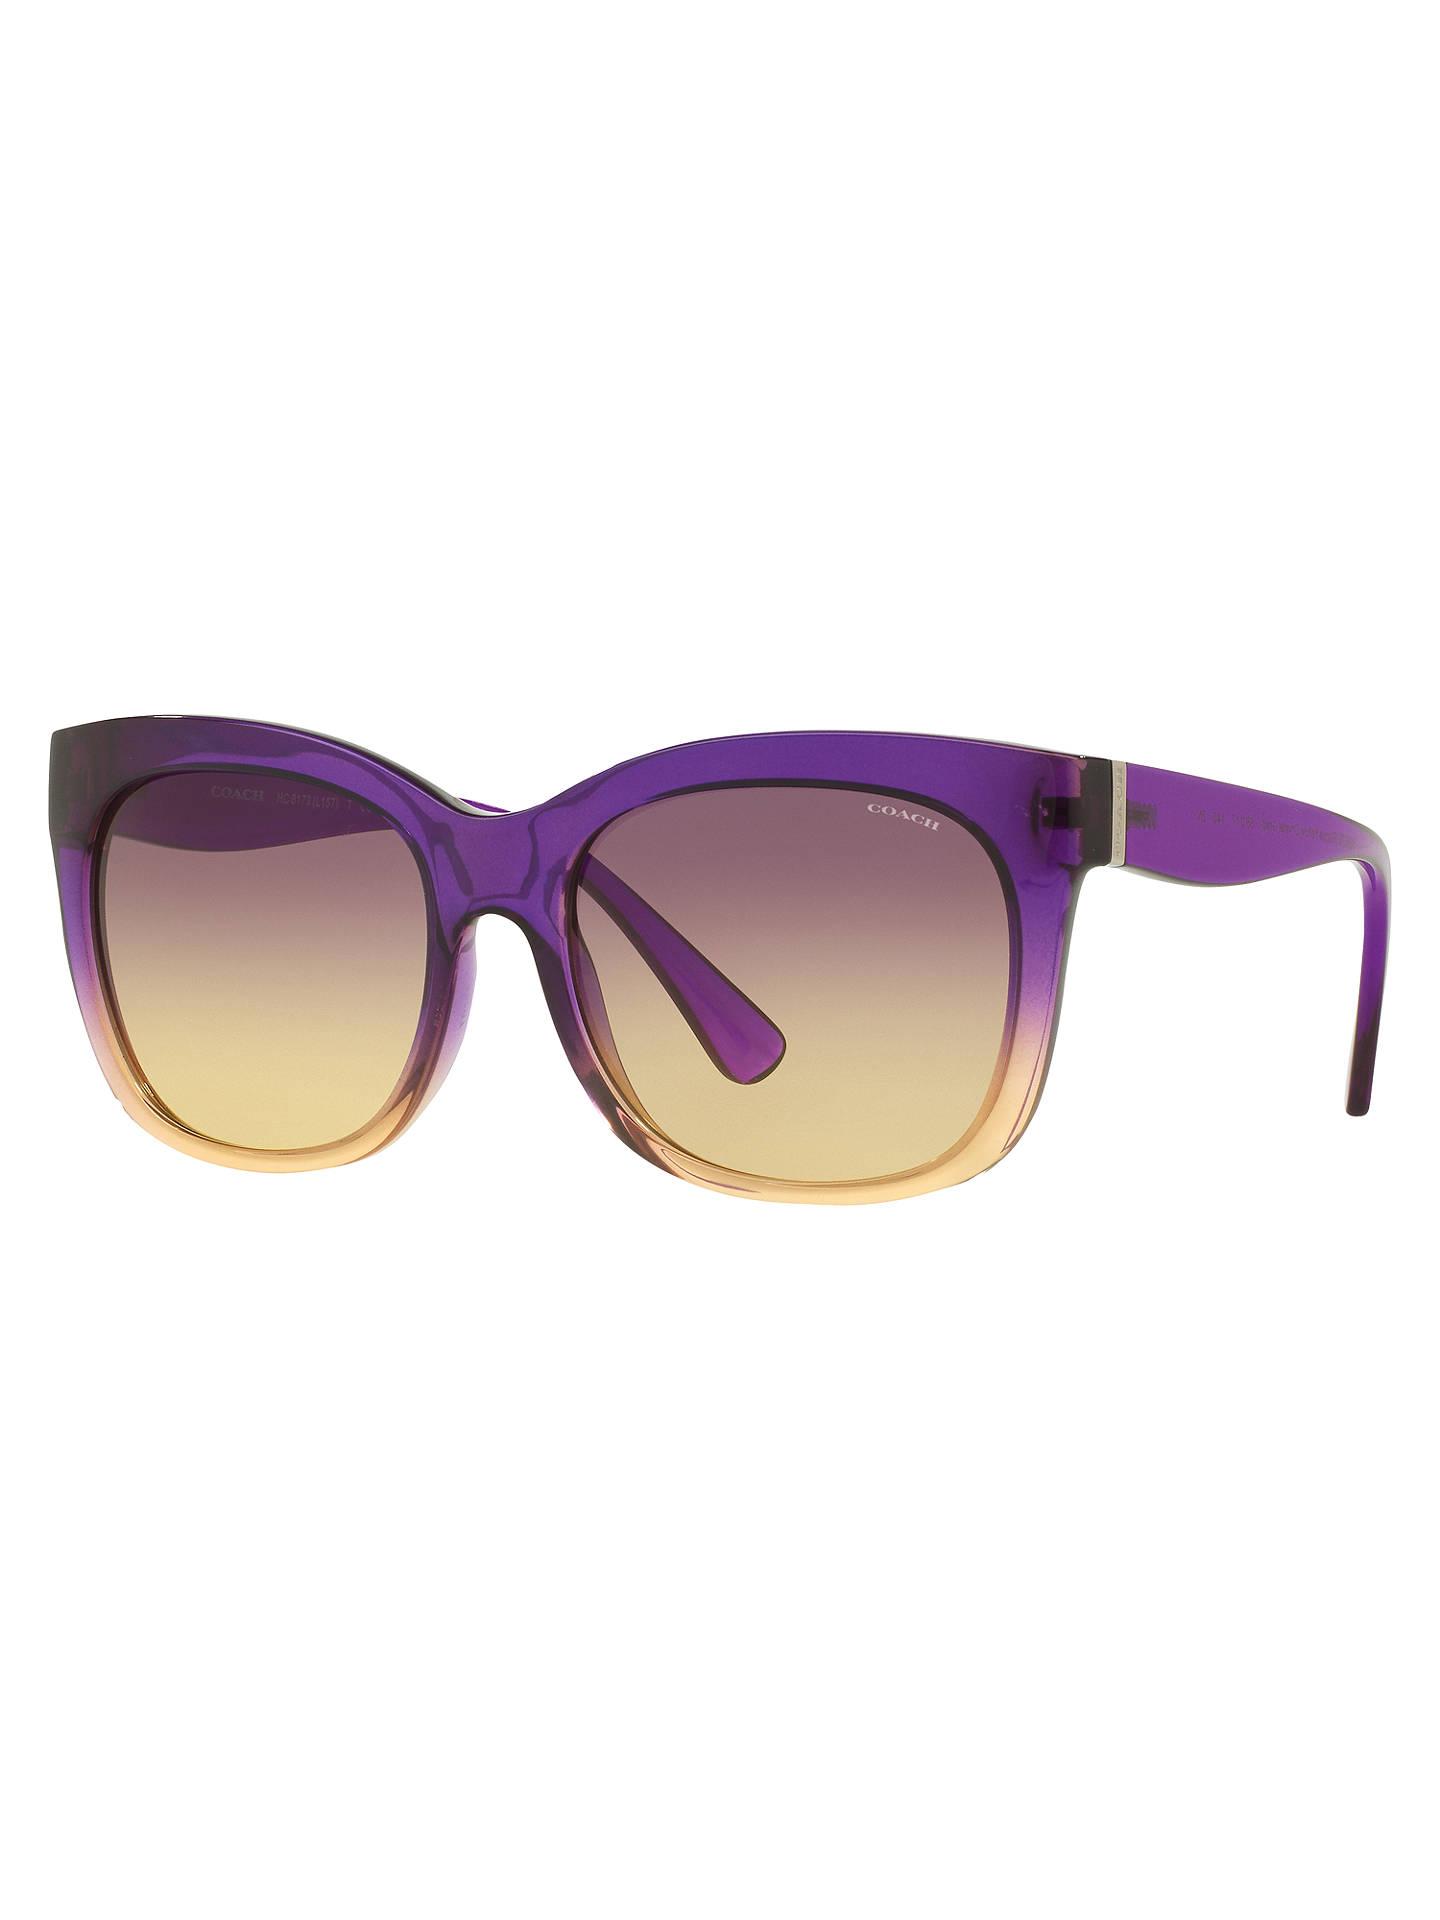 4ba5722e1241 Buy Coach HC8173 Square Sunglasses, Purple/Yellow Online at johnlewis.com  ...